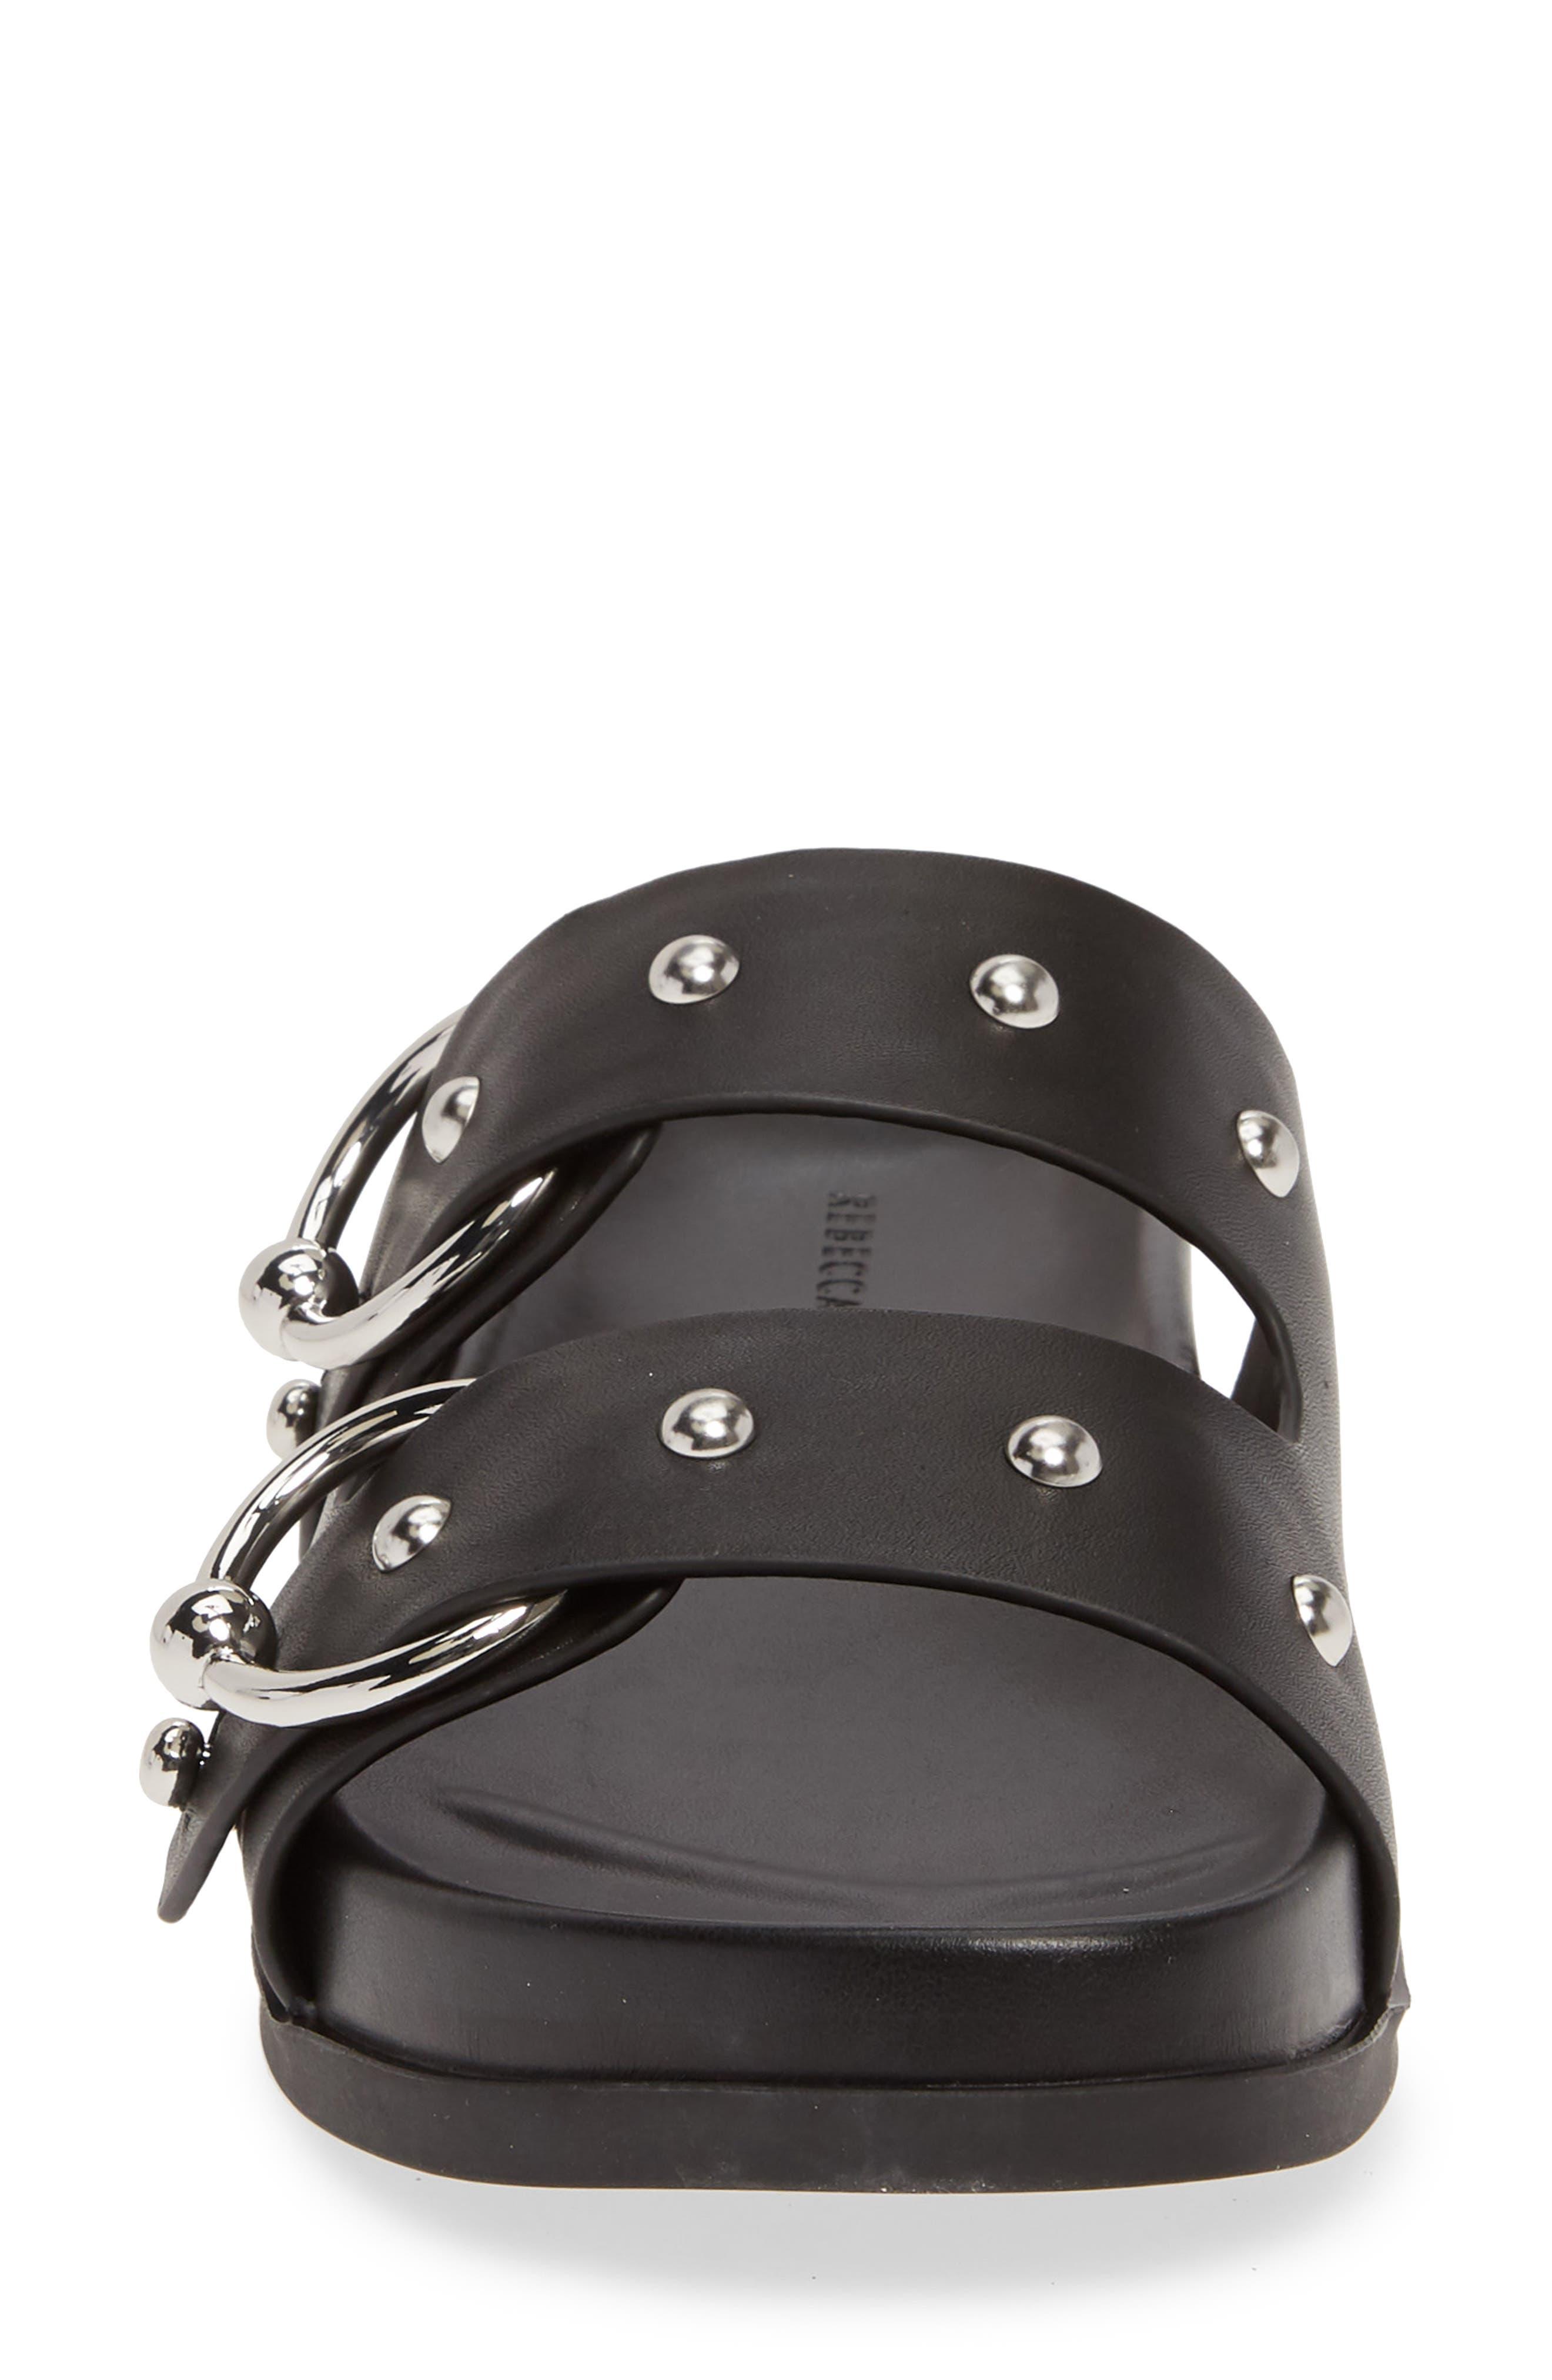 REBECCA MINKOFF, Vachel Slide Sandal, Alternate thumbnail 4, color, BLACK LEATHER